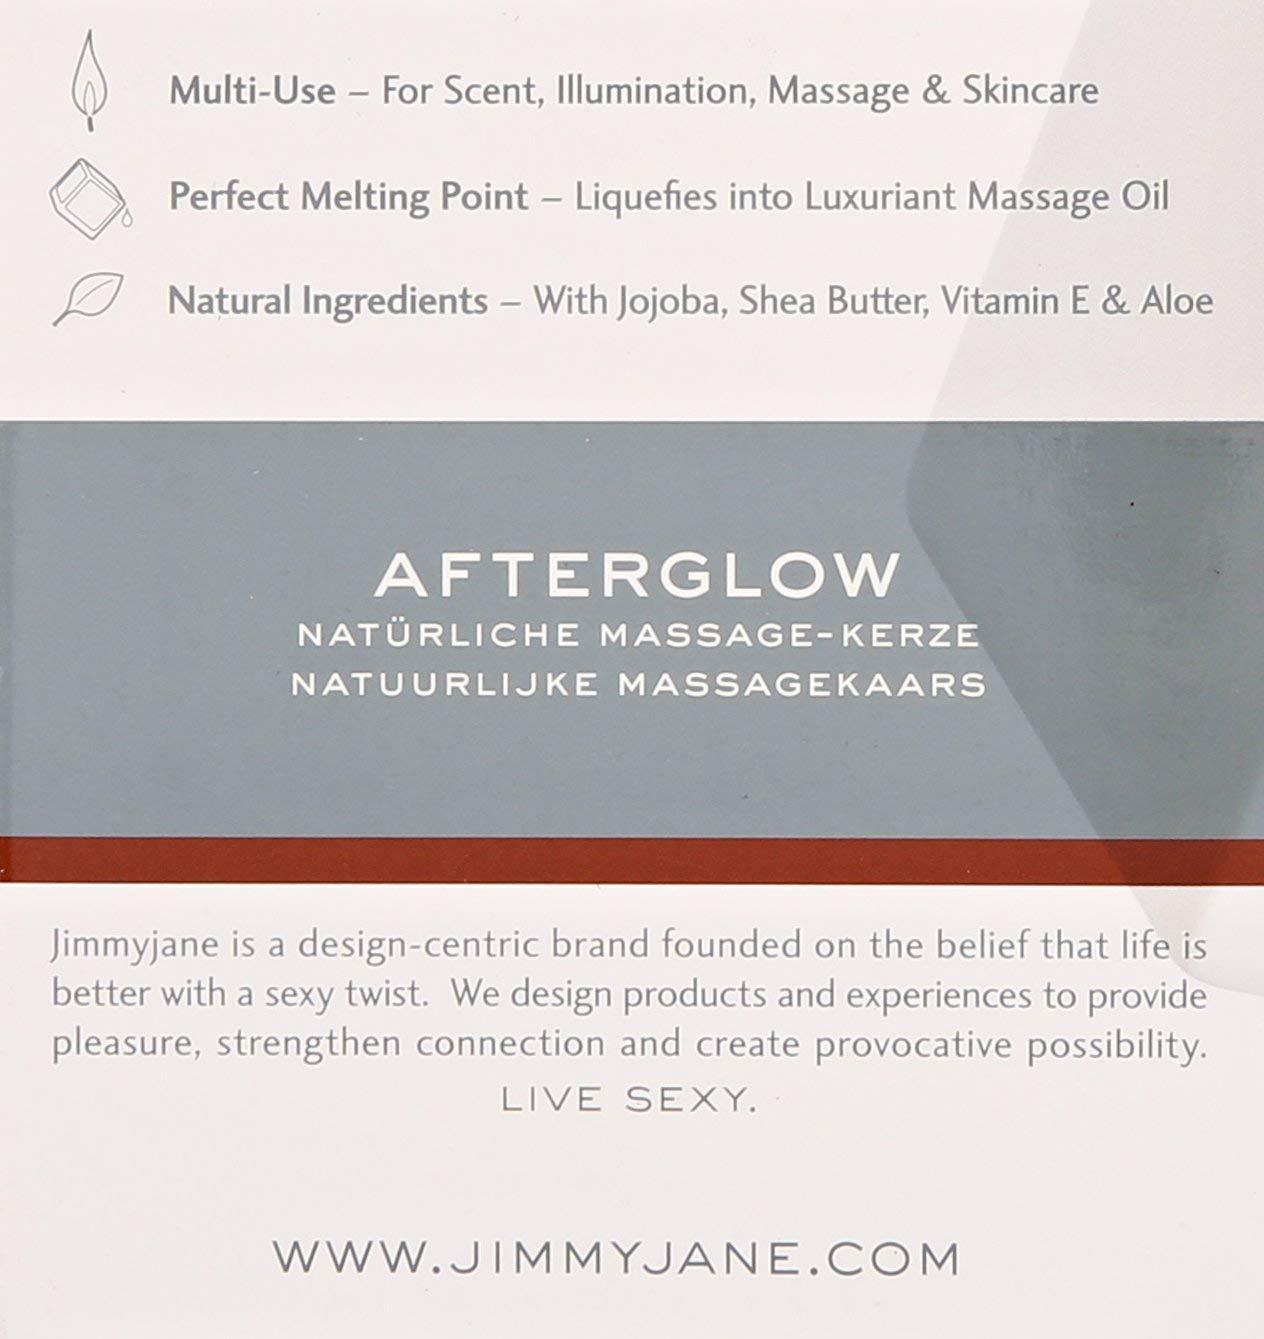 Jimmyjane Afterglow Massage Oil Candle, Dark Vanilla - Two pack